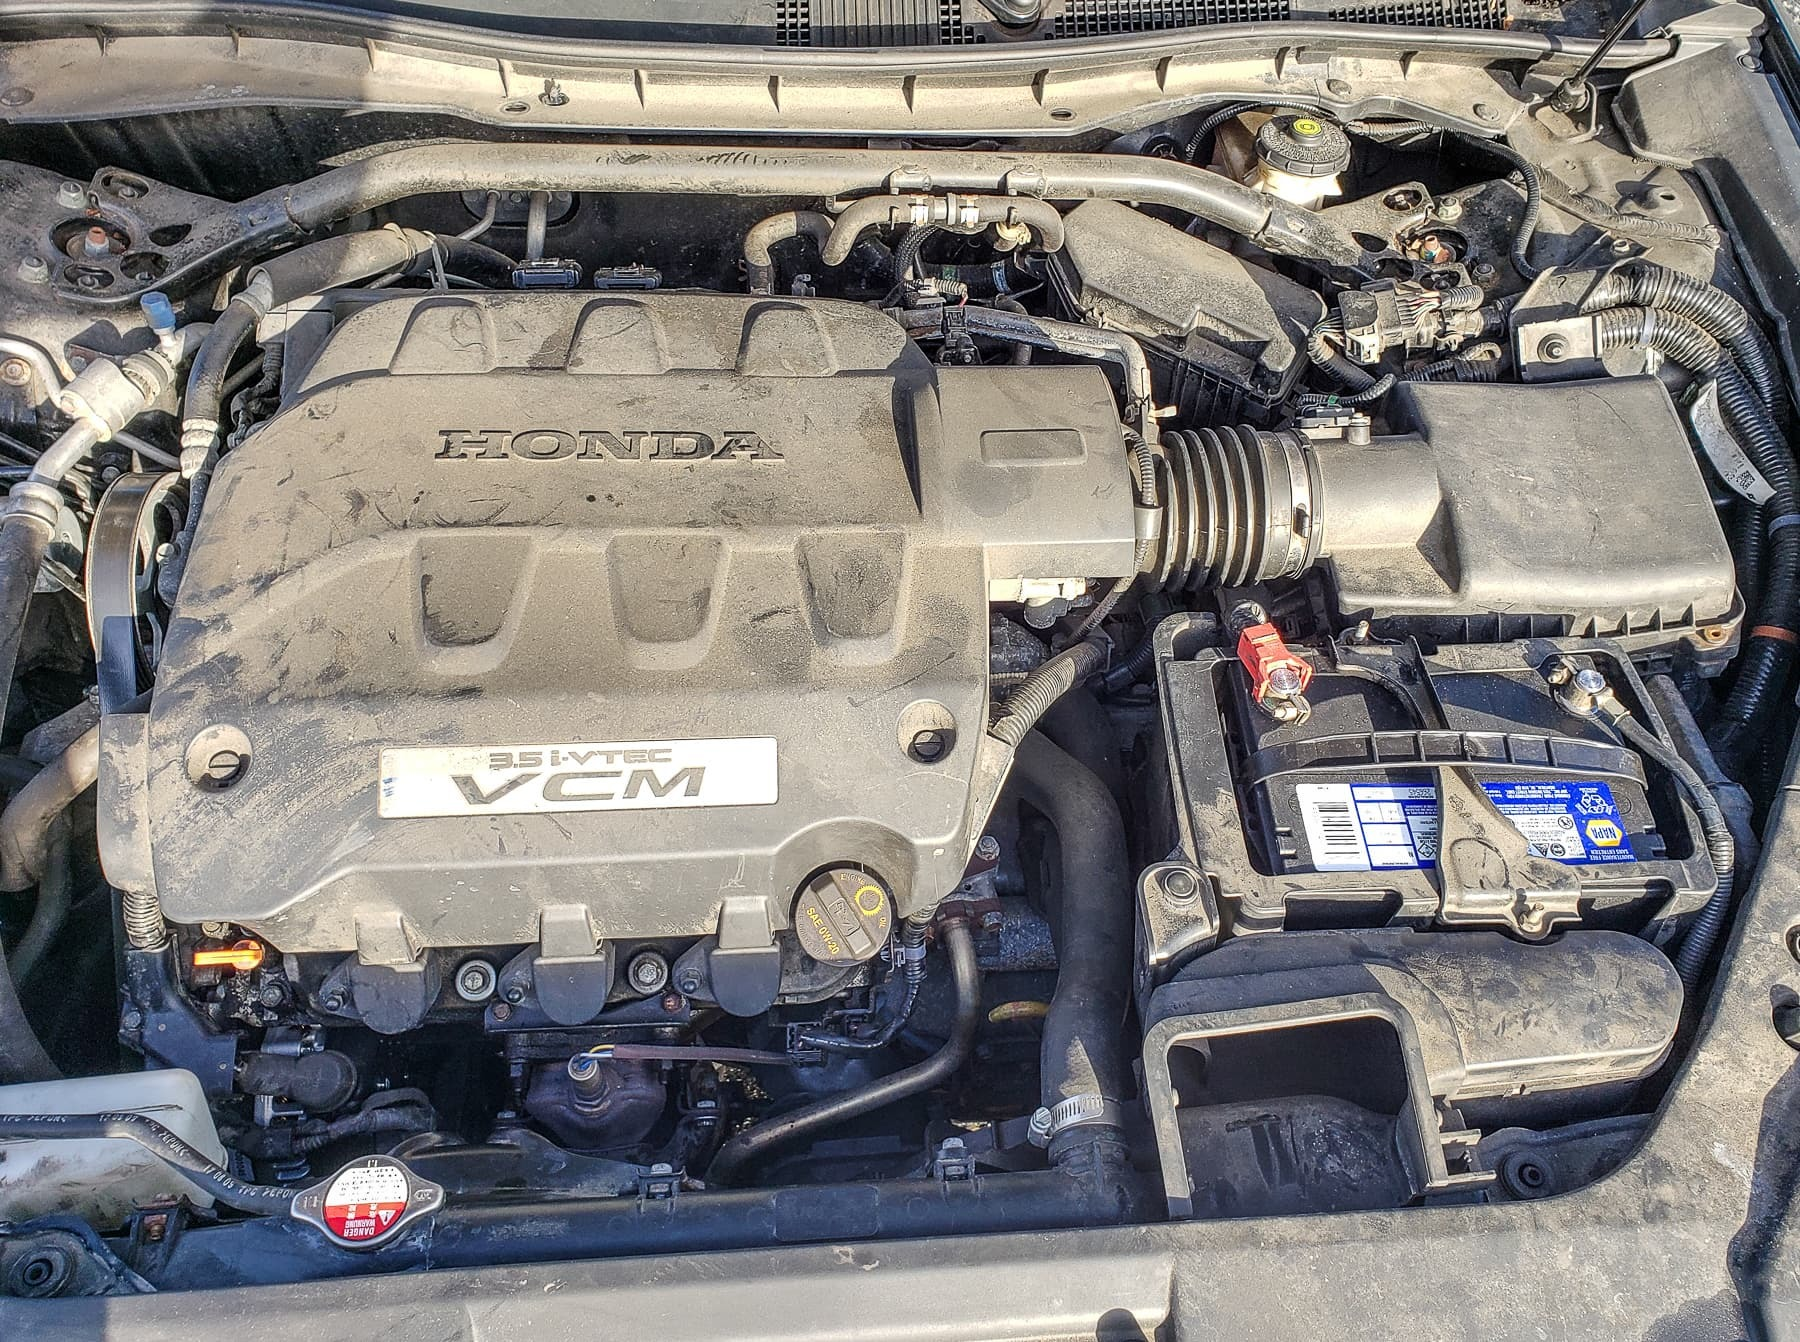 2010 Honda Crosstour, Alternator Replacement